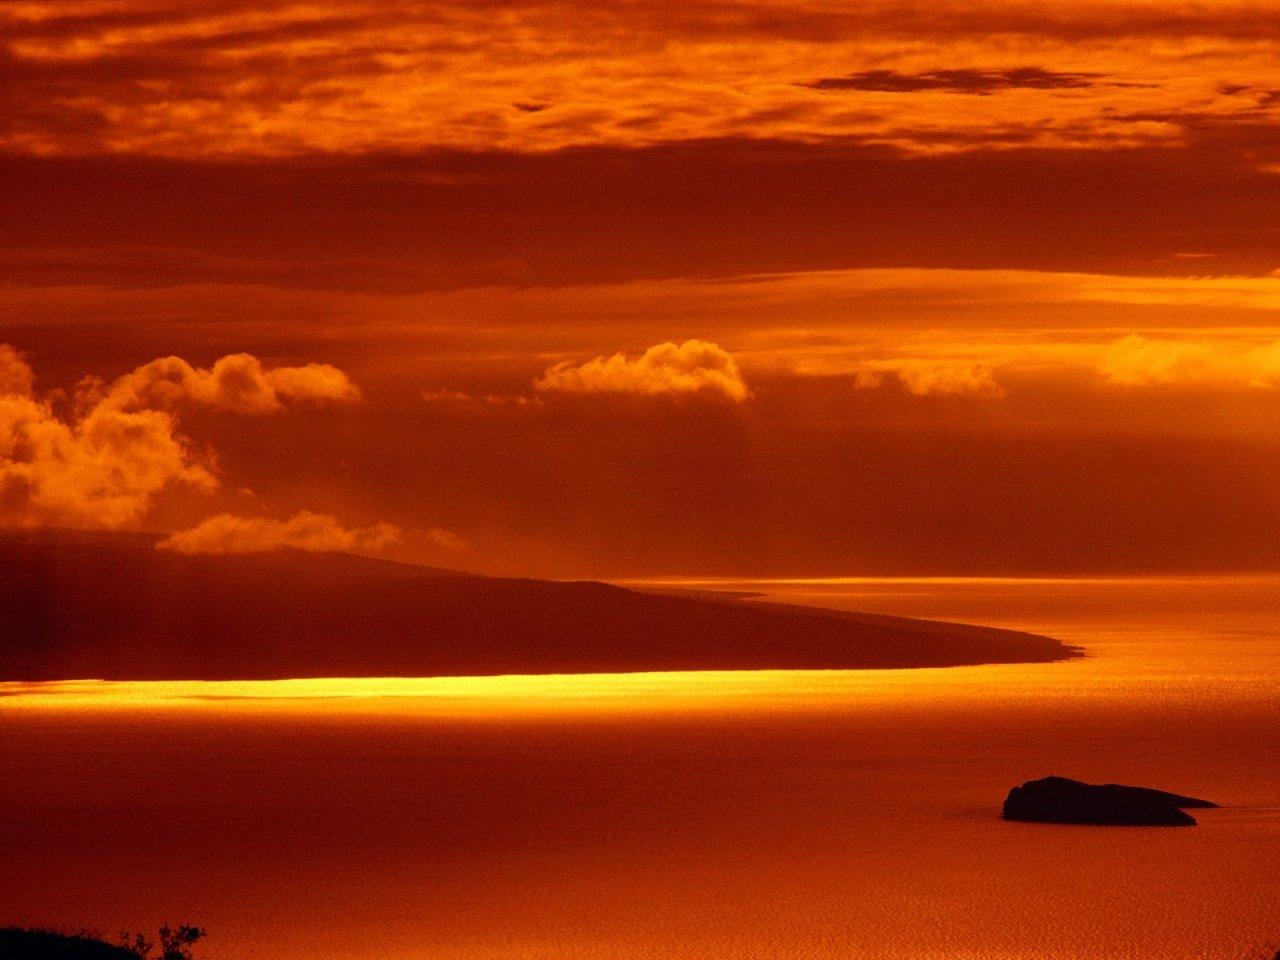 1280x1024 Hawaii Hot Sunset desktop PC and Mac wallpaper